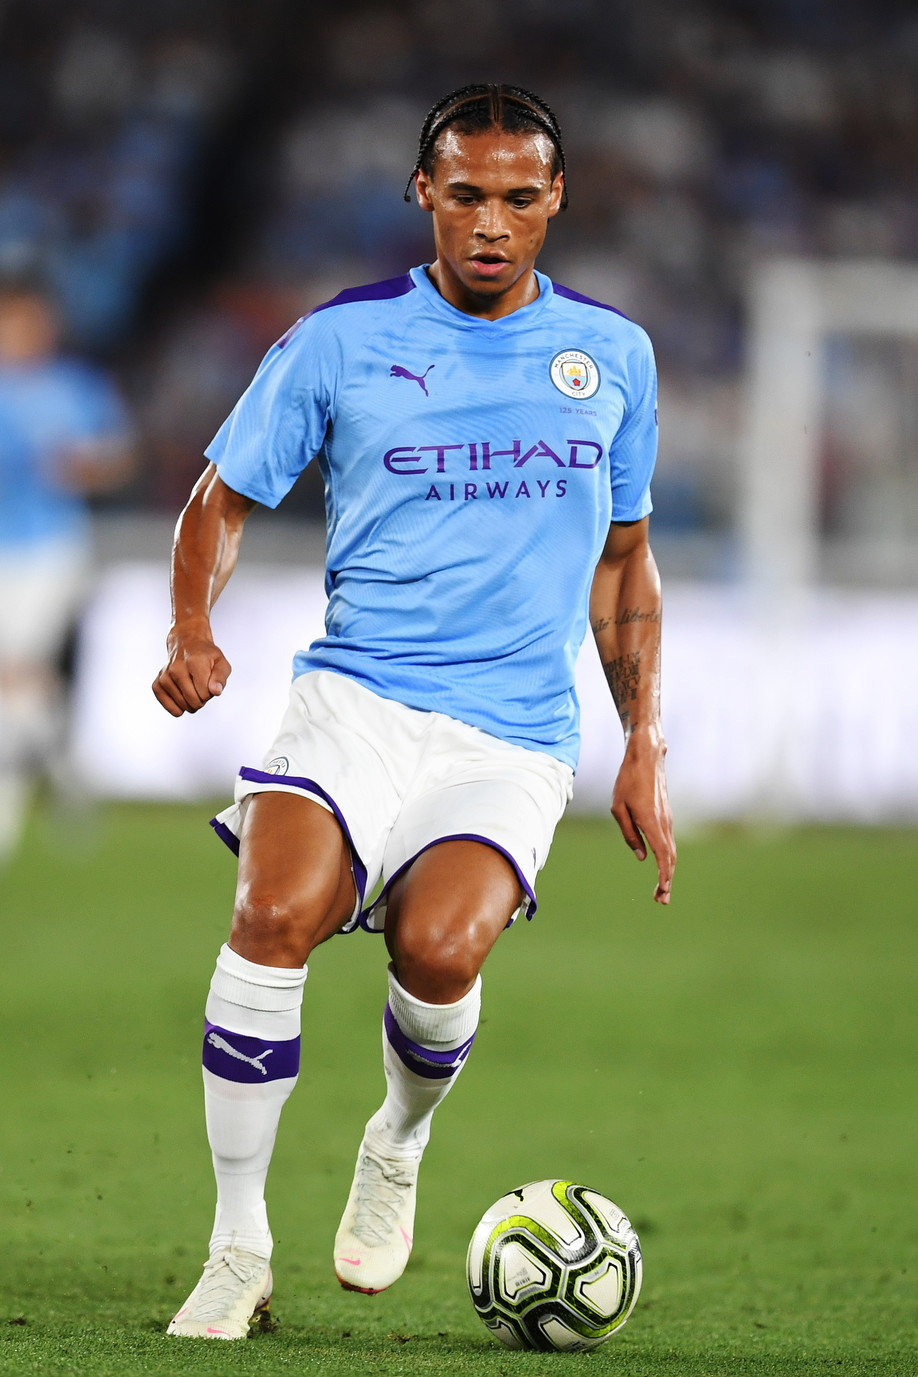 Leroy Sané (Manchester City)